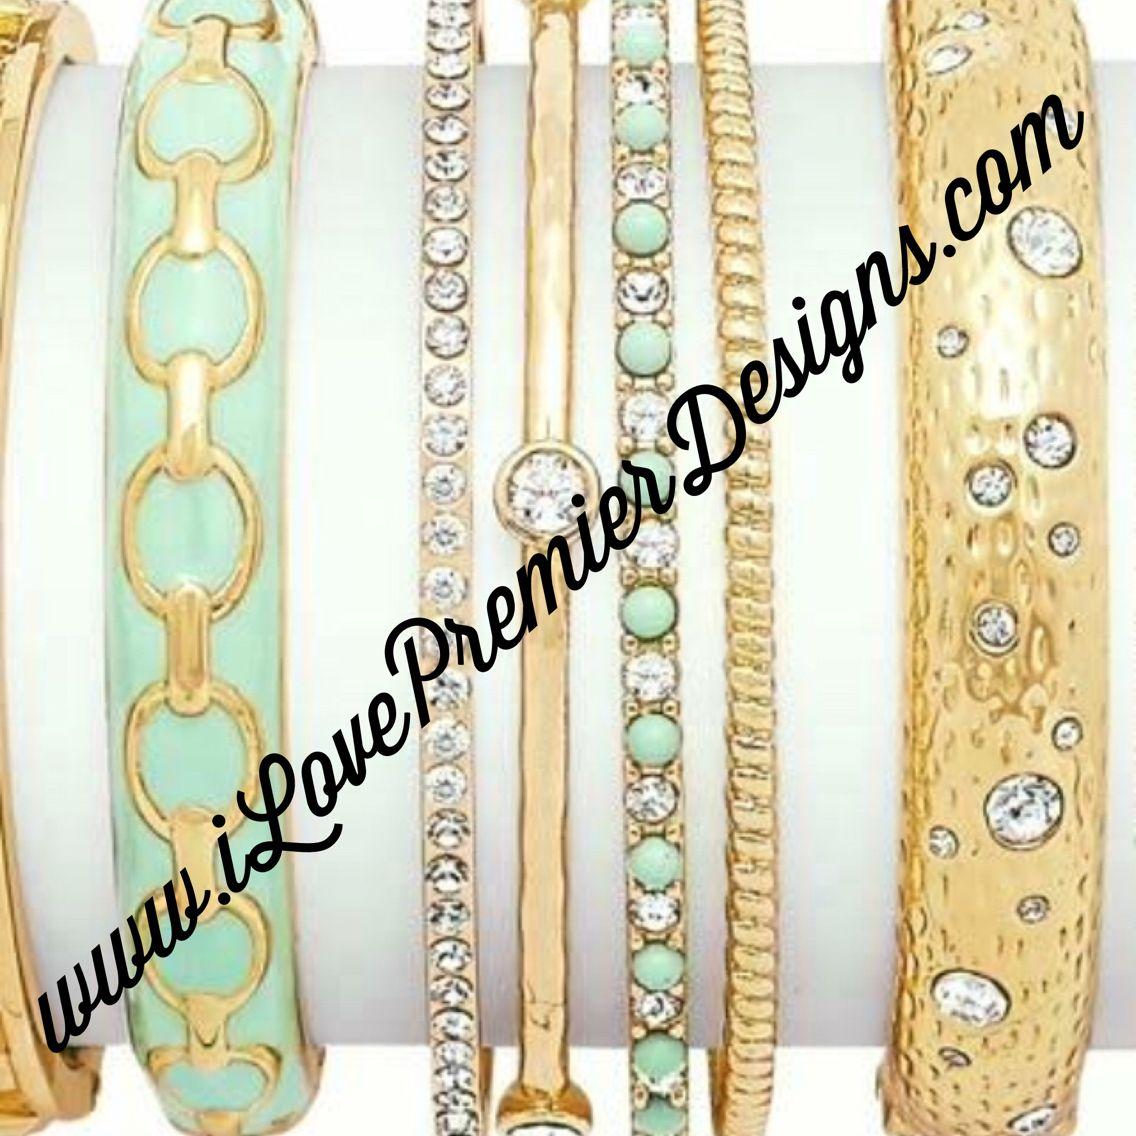 Beautiful gold bracelets! Visit my website: www.ilovepremierdesigns.com